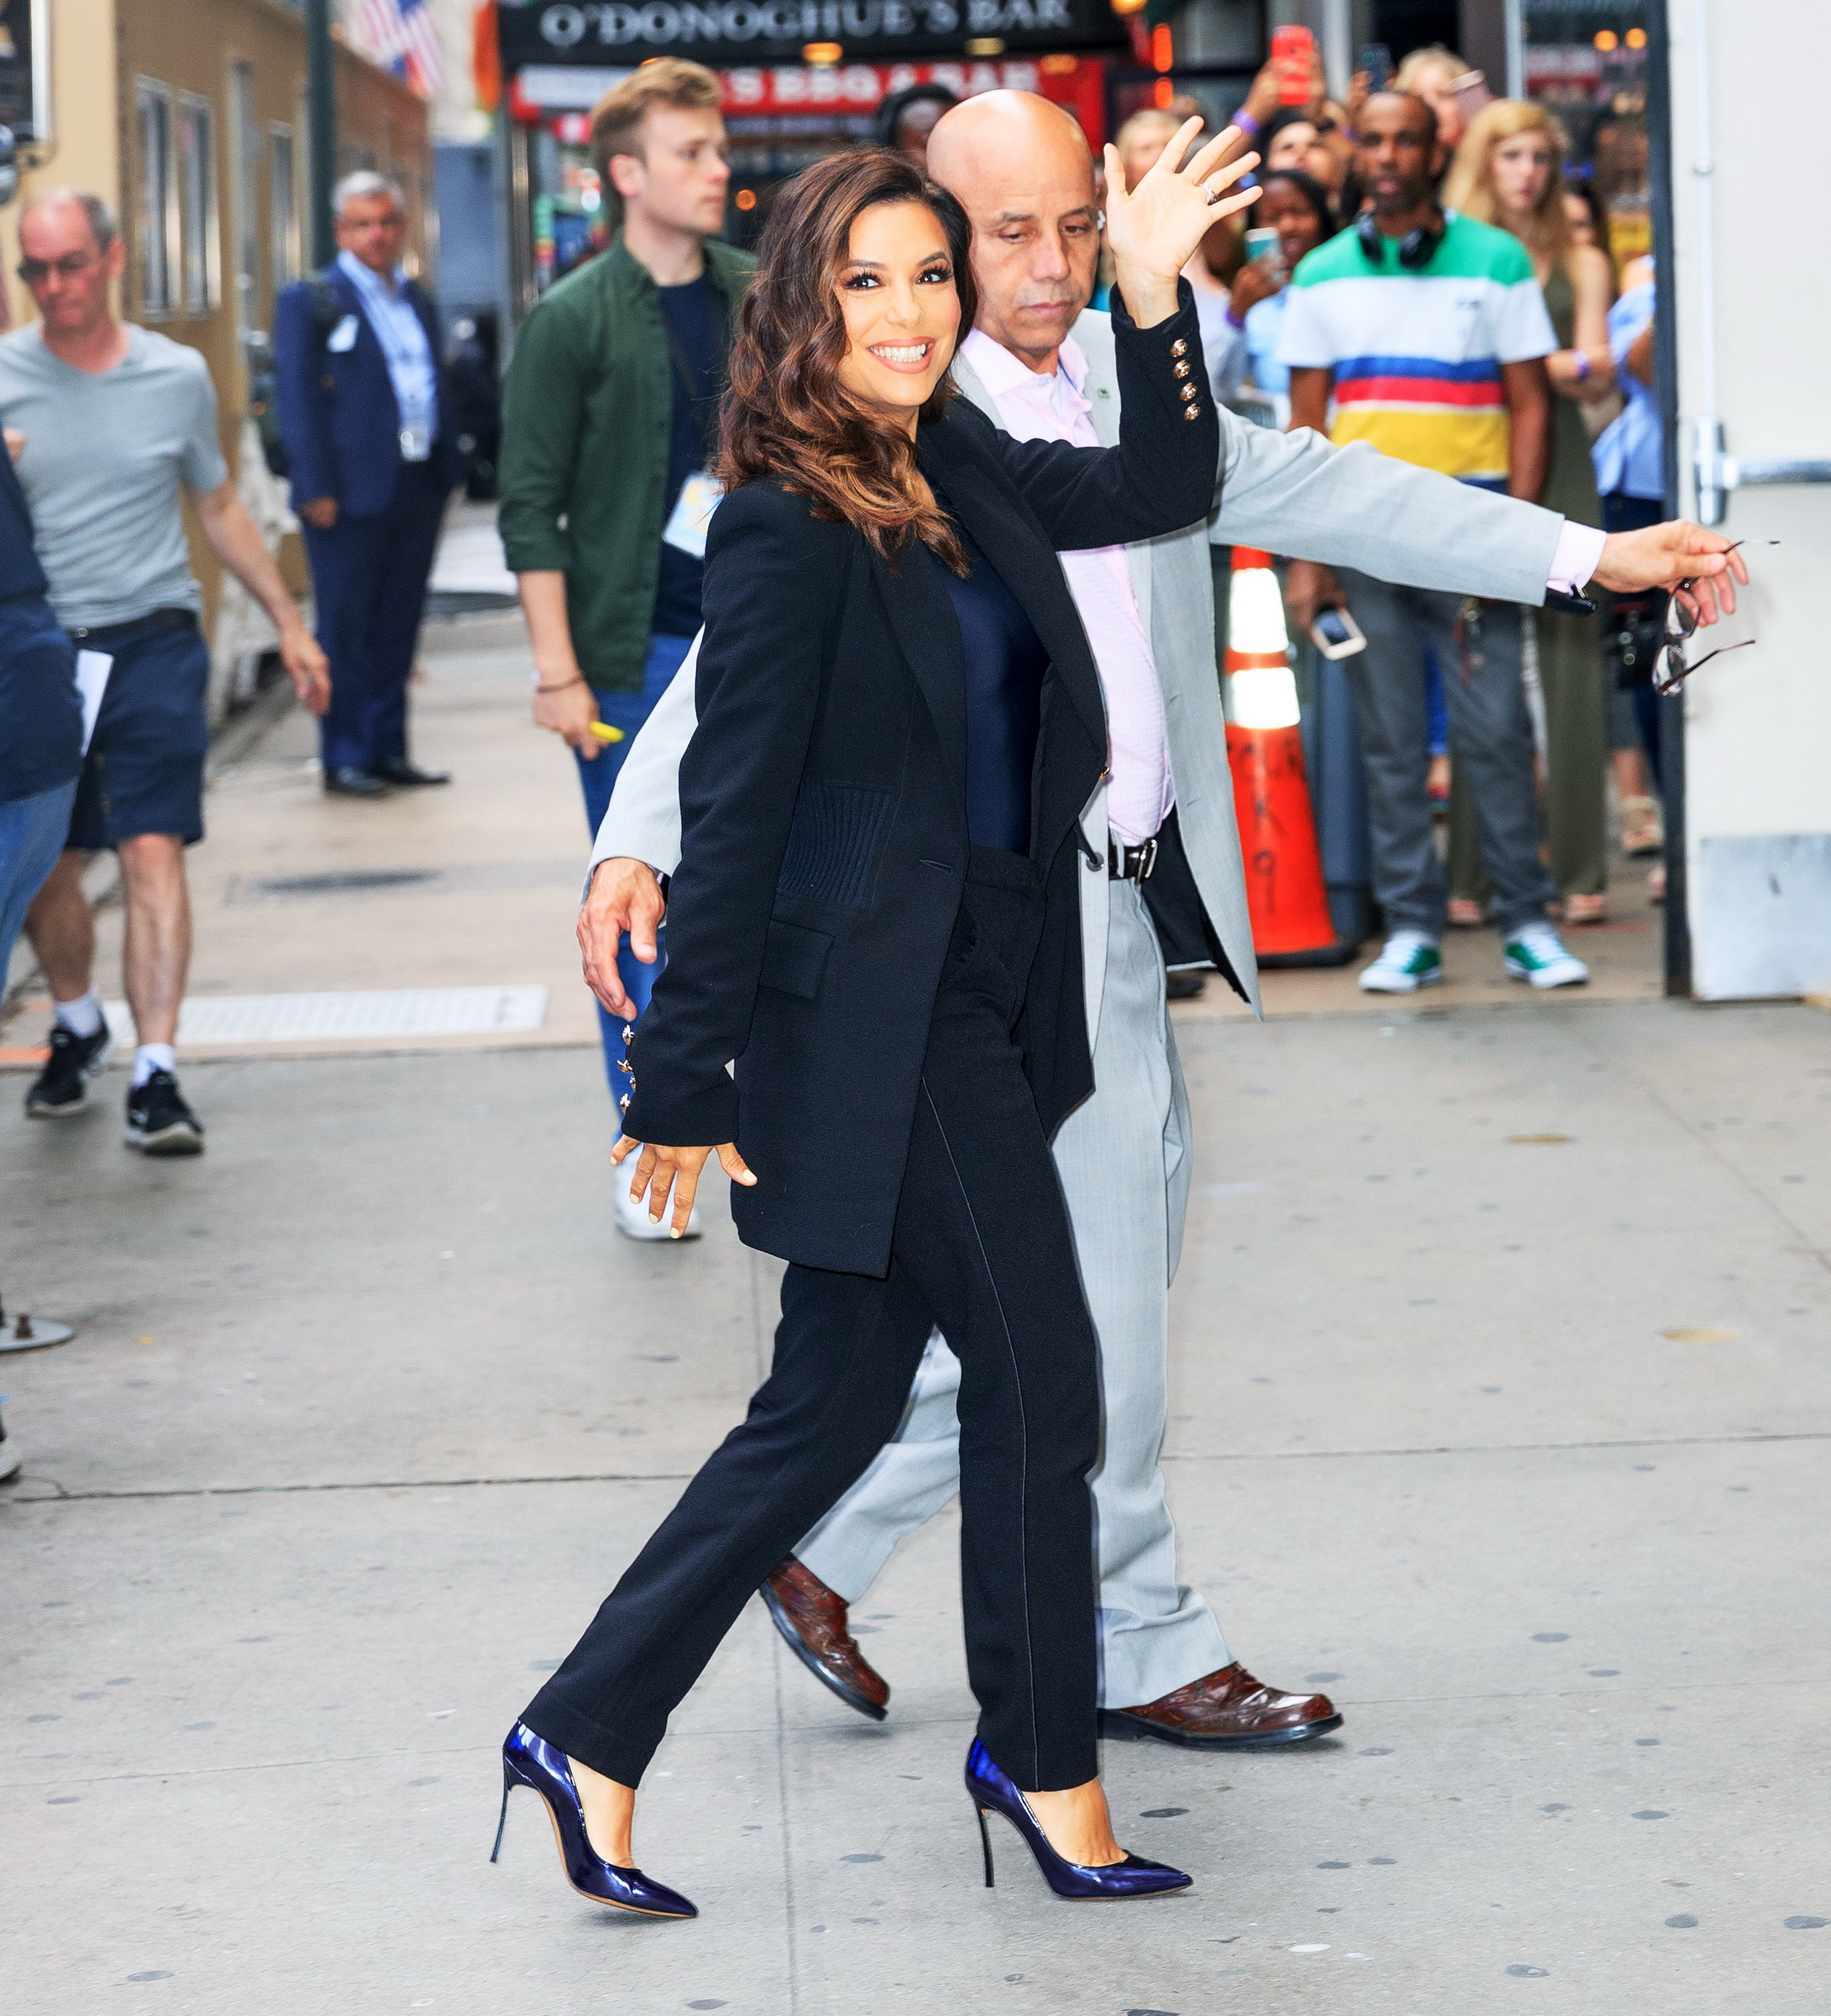 Celebrity Sightings In New York City - June 17, 2019